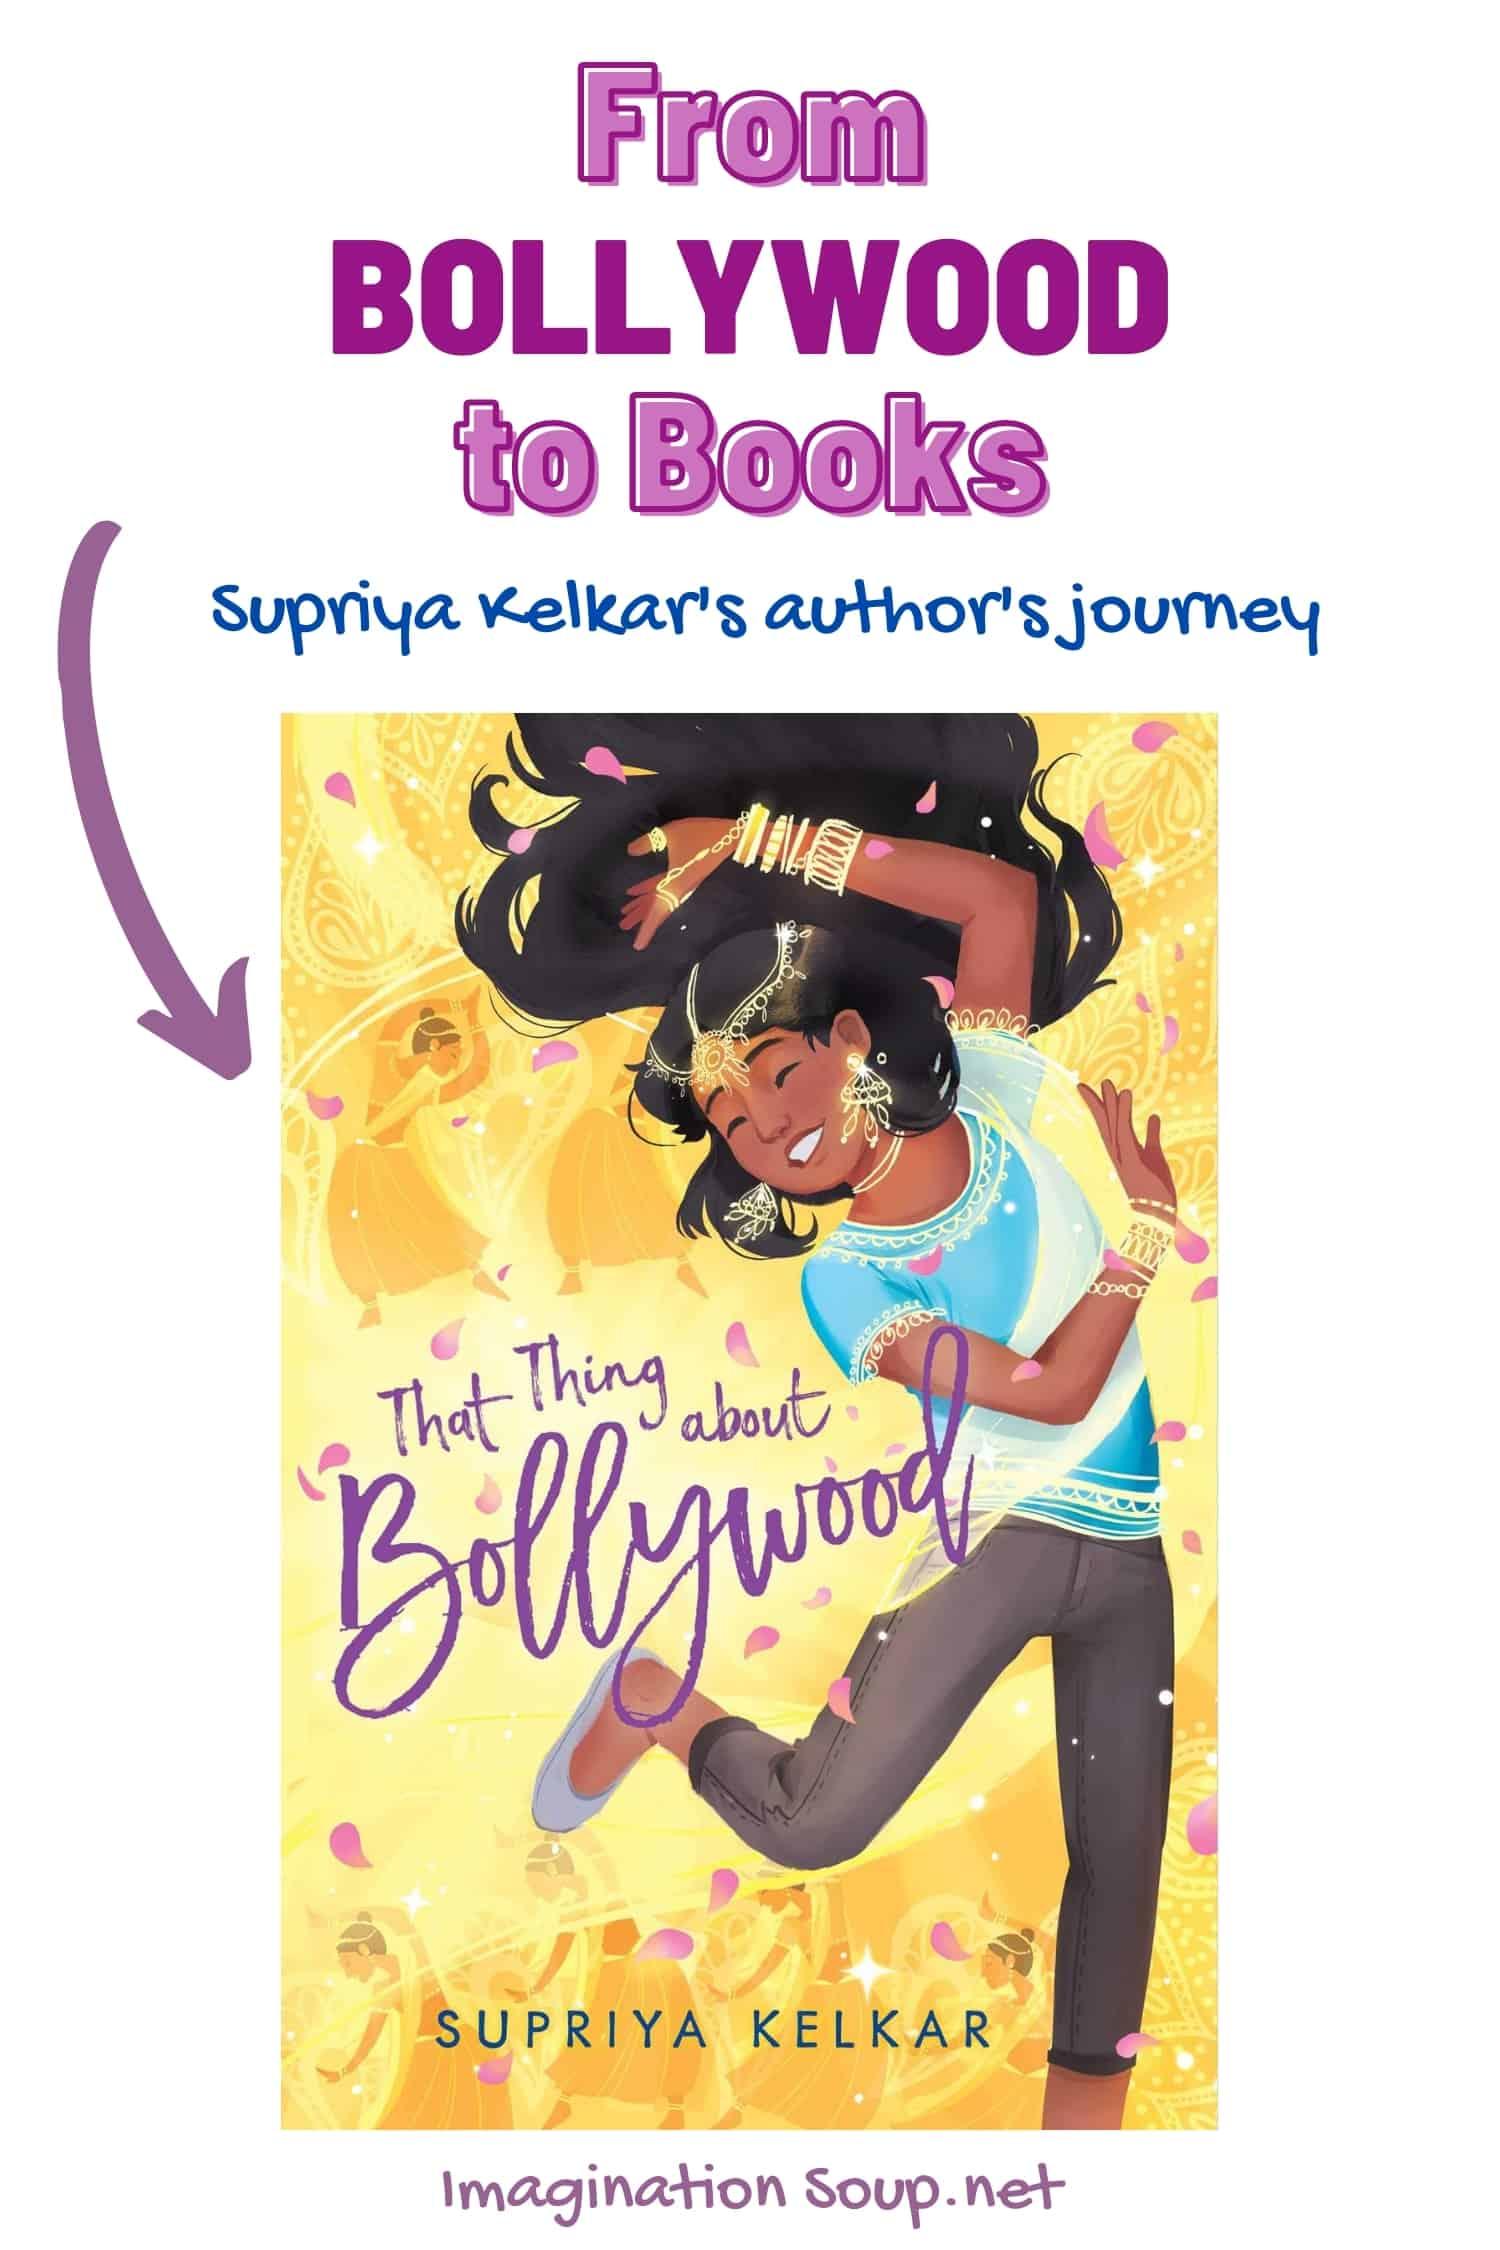 From Bollywood to Books Supriya Kelkar's author's journey